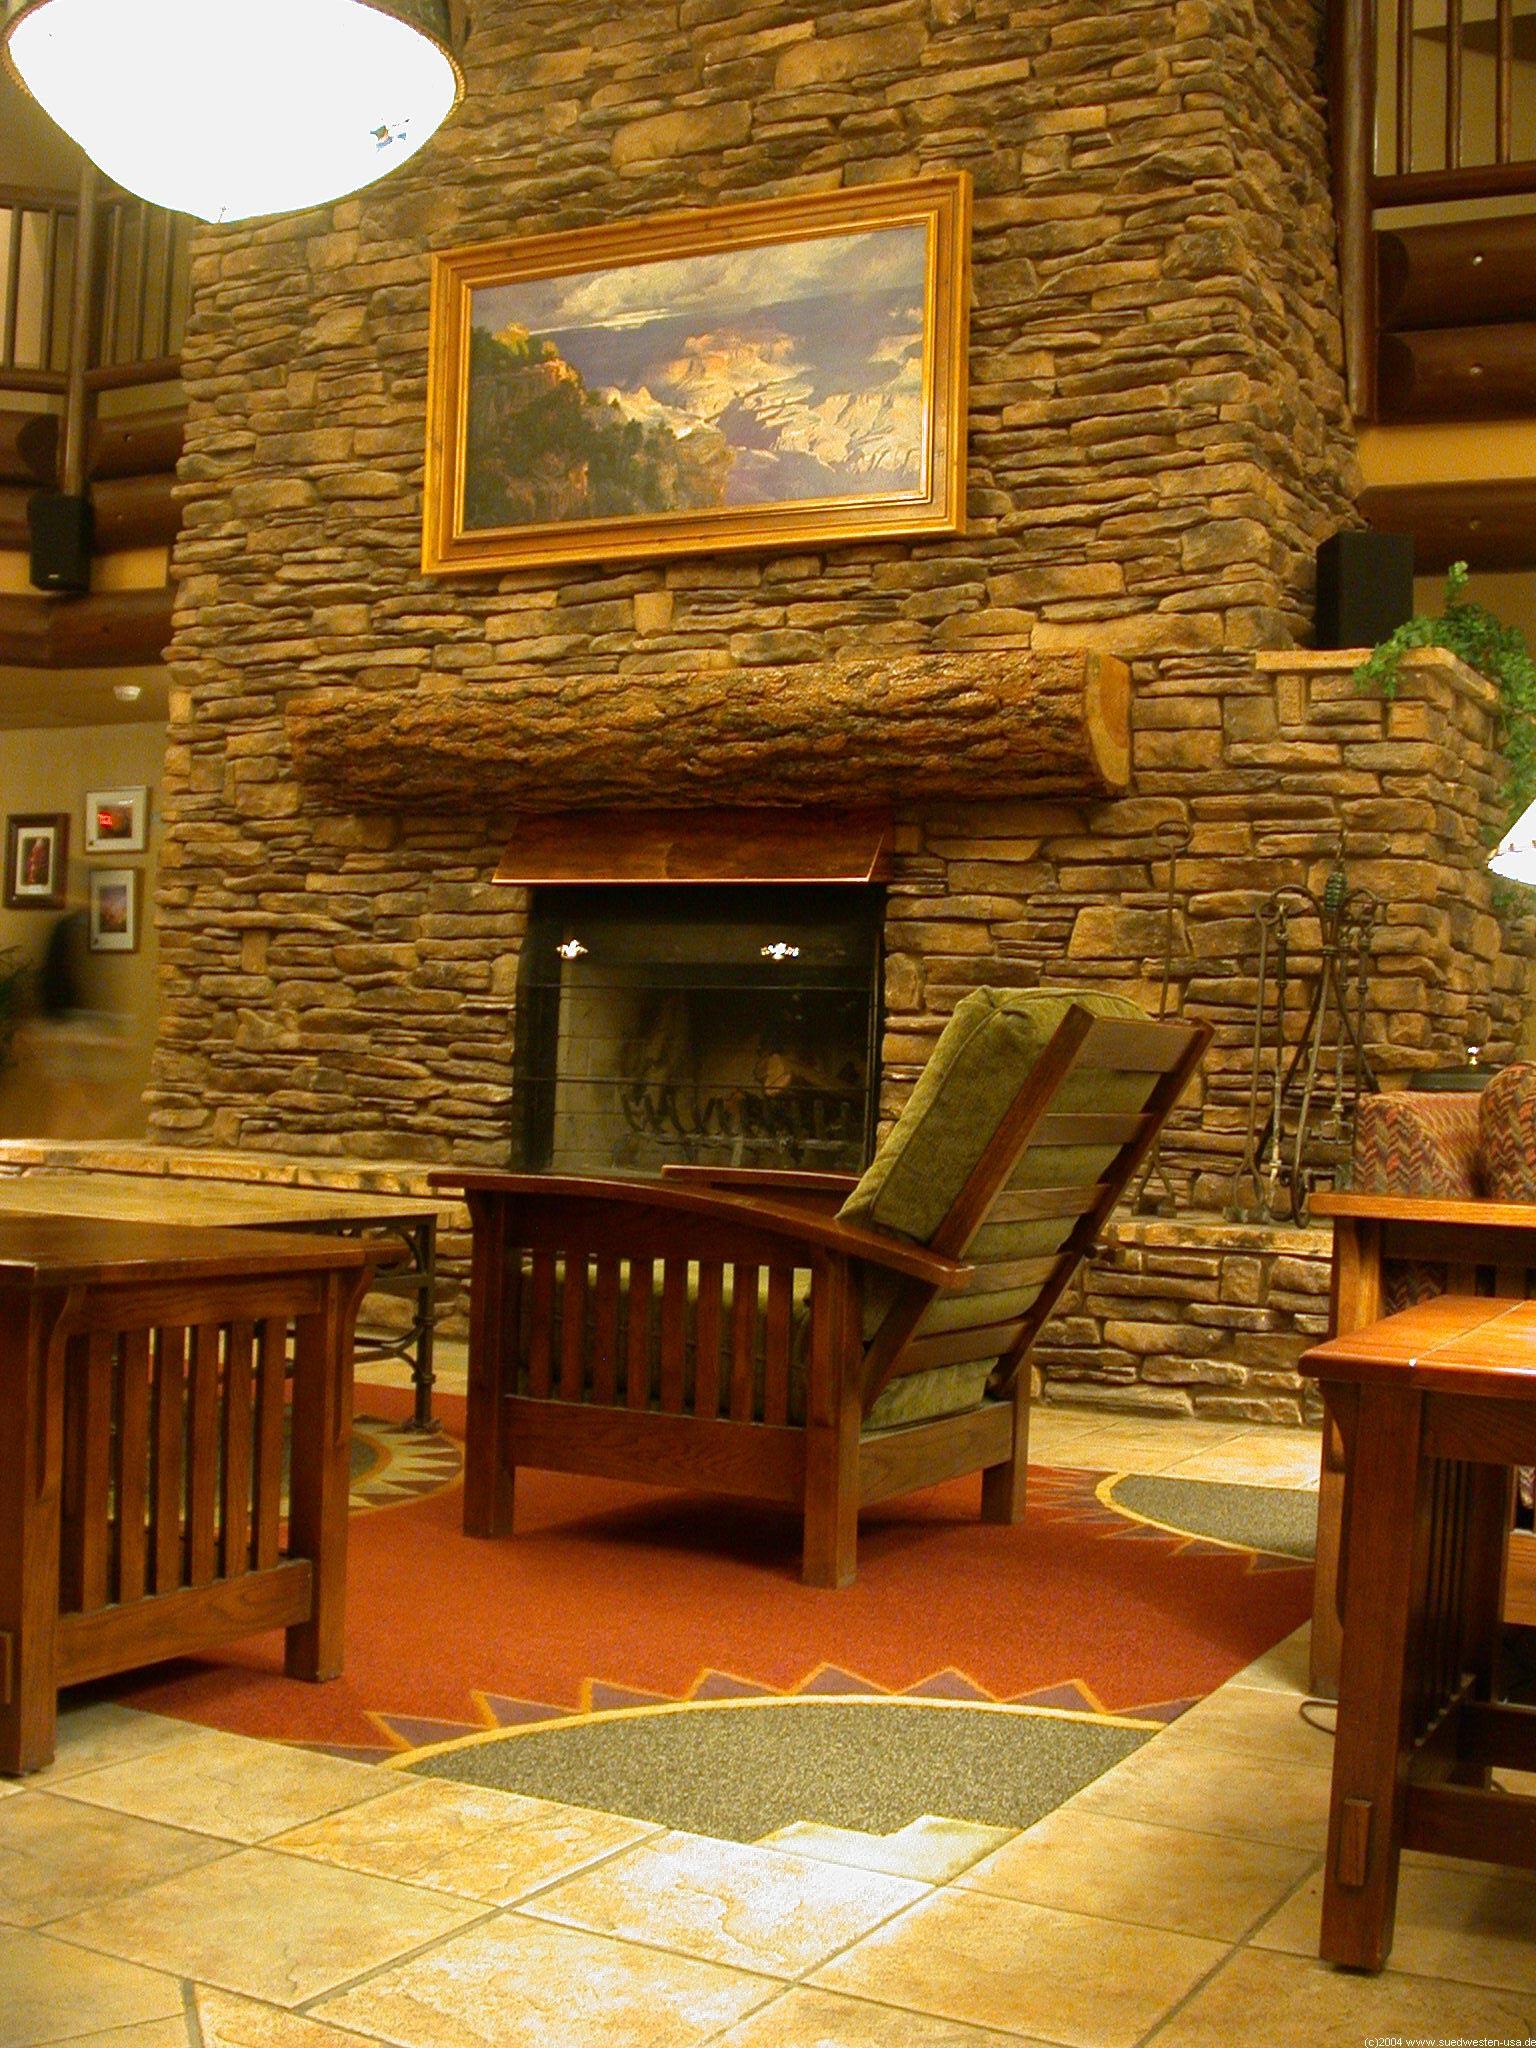 Grand Canyon Nationalpark An Und Unterkunft 2003 Tusayan Grand Hotel In Tusayan